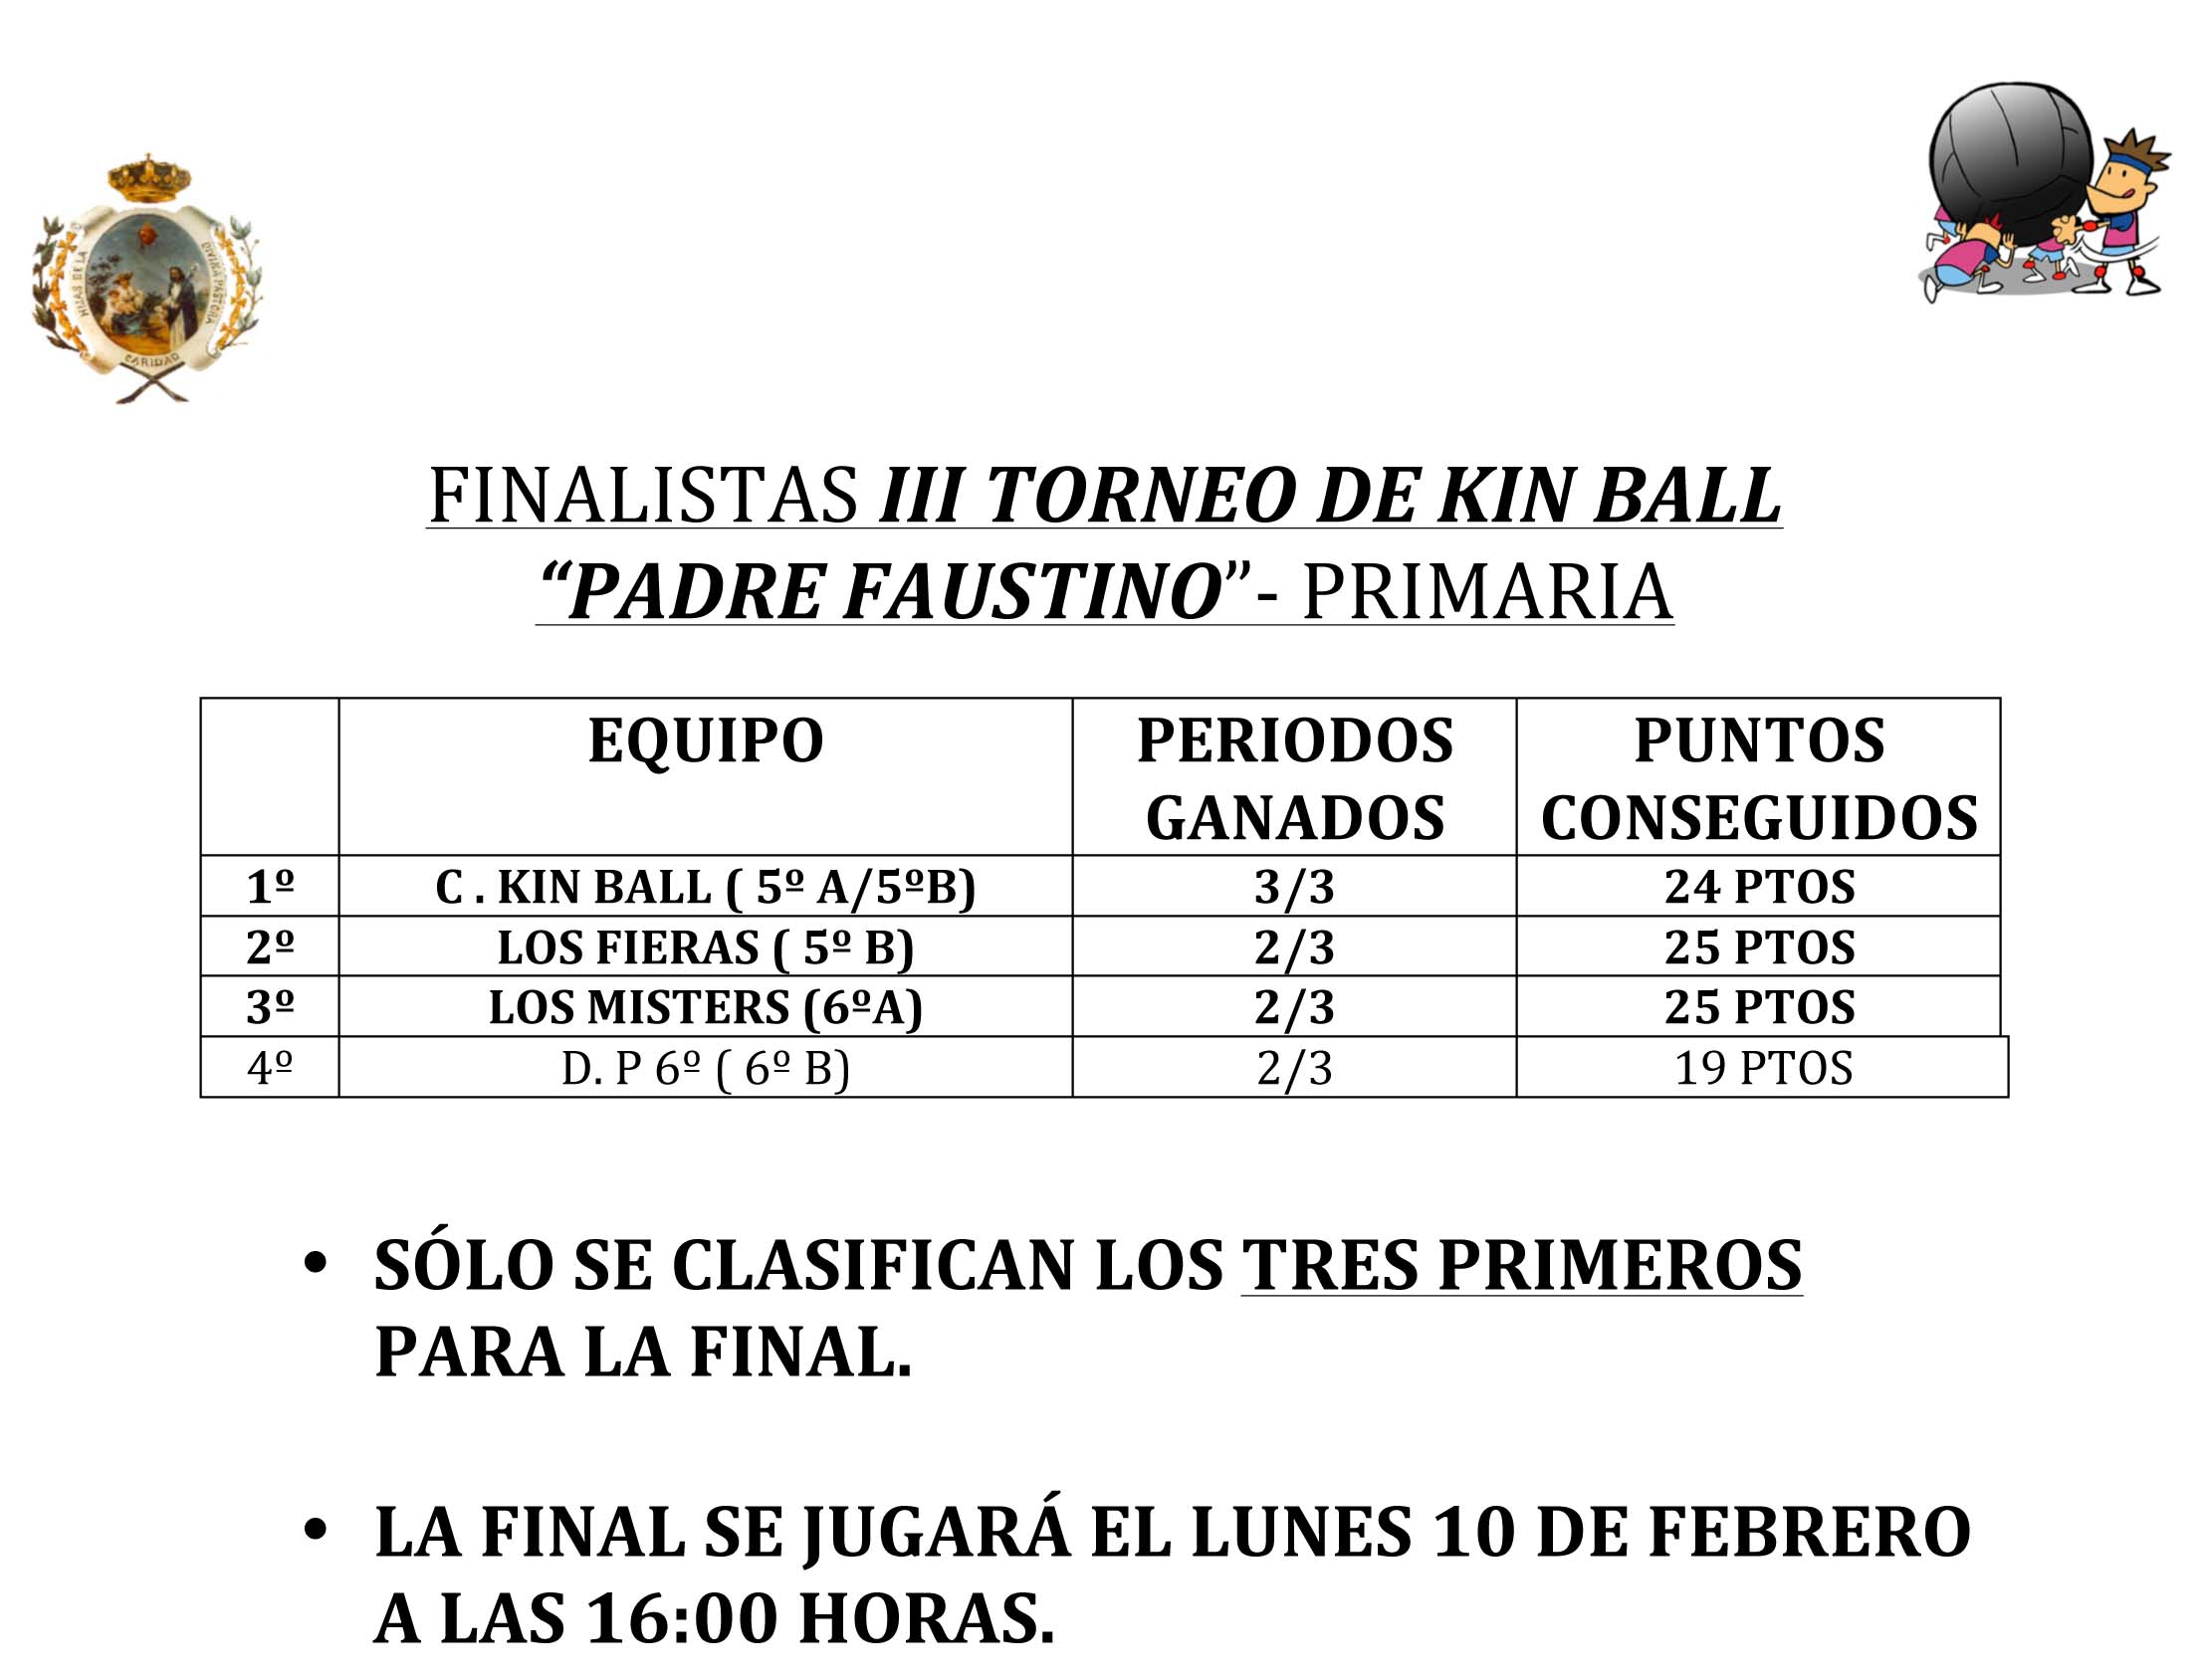 Microsoft Word - FINALISTAS III TORNEO DE KIN BALL.docx